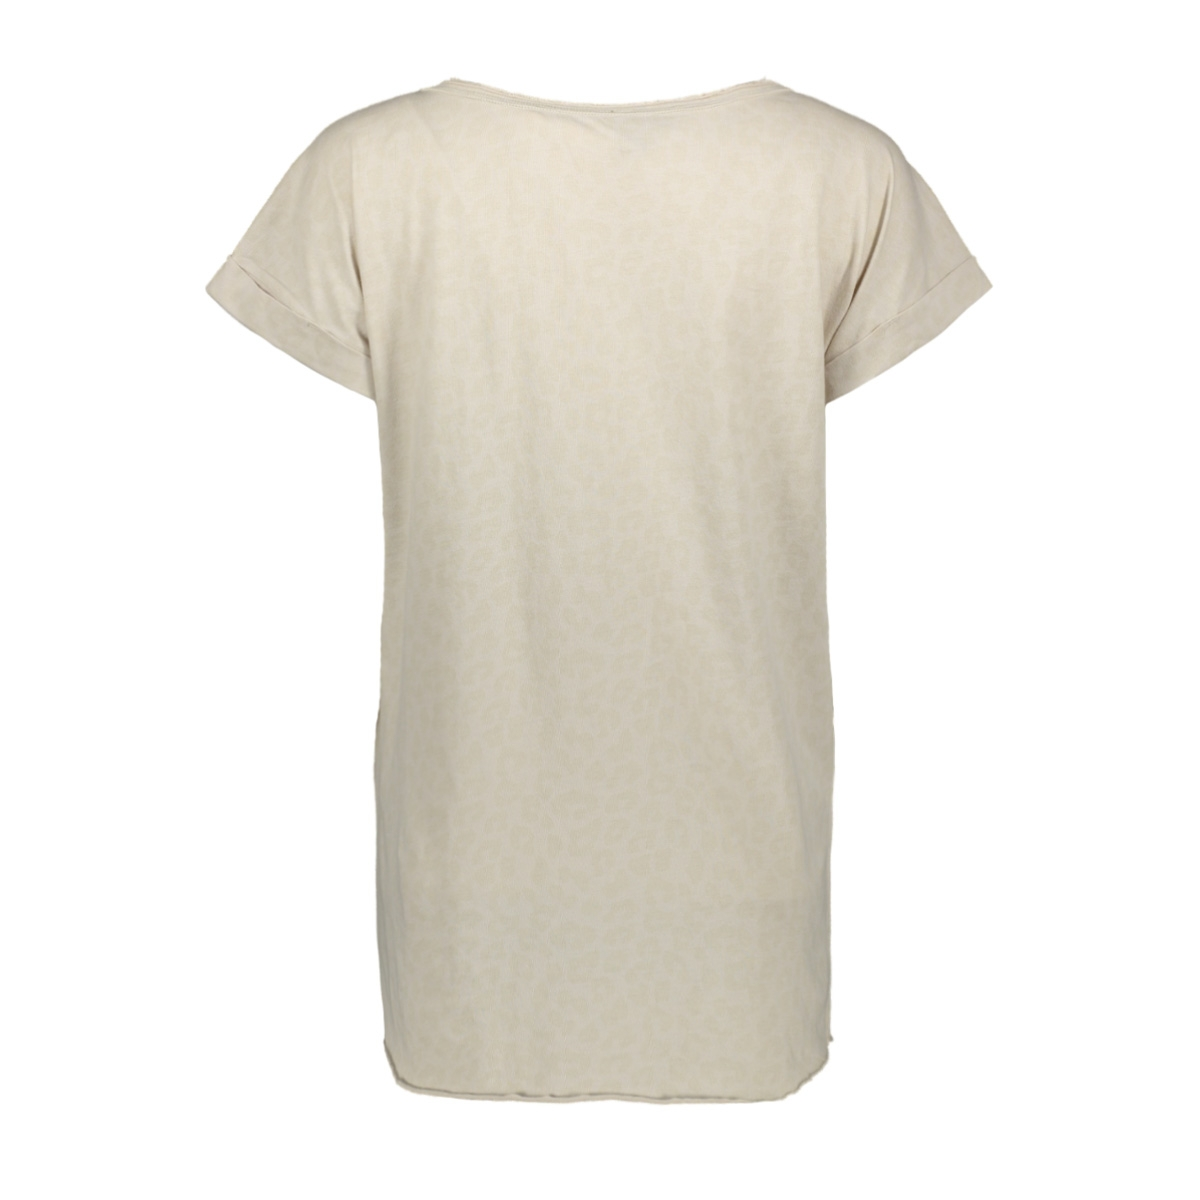 tee leopard 20 751 8103 10 days t-shirt bone